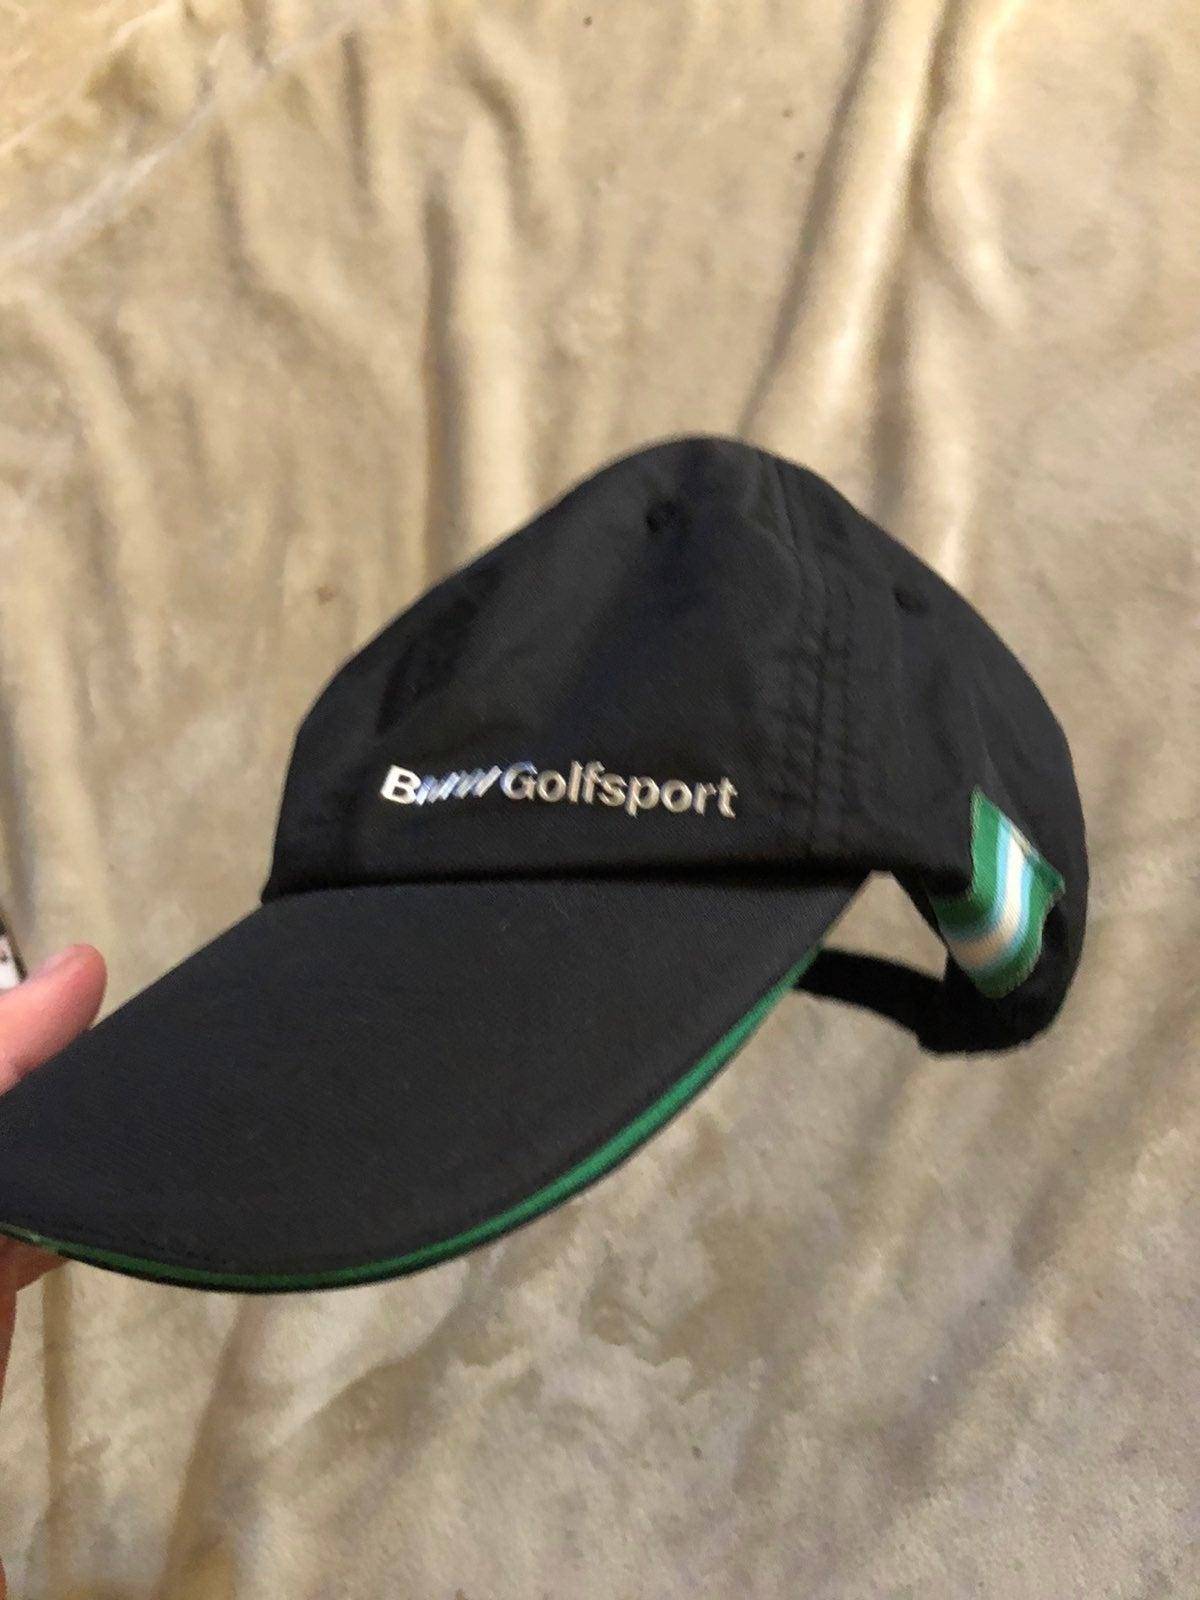 BMW golf sport black hat